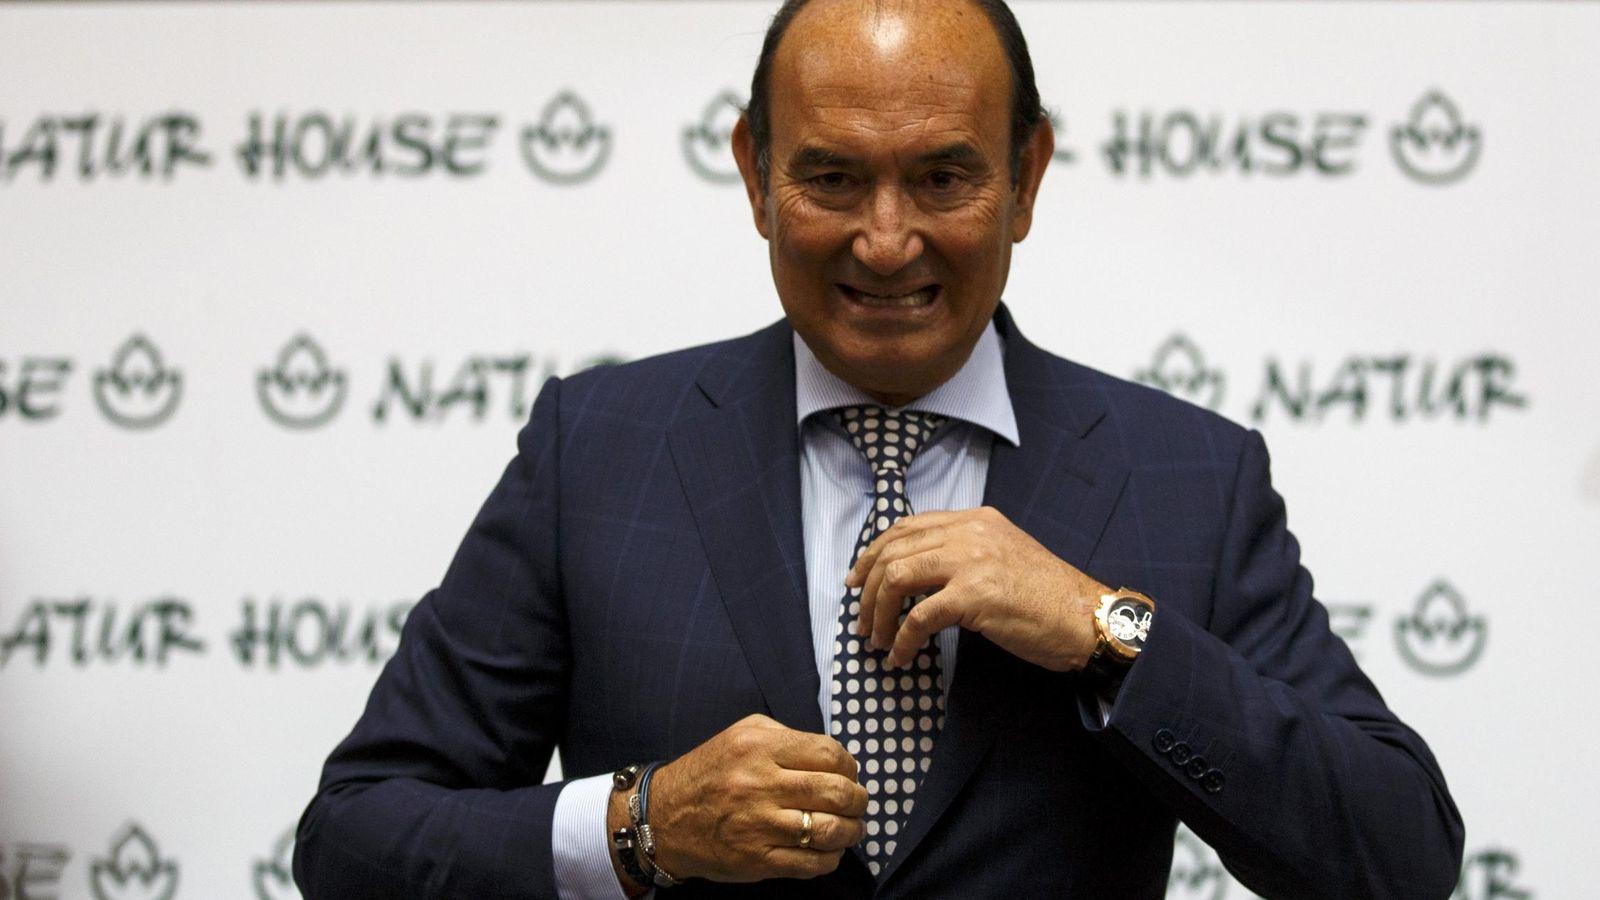 Foto: Félix Revuelta, presidente de Naturhouse